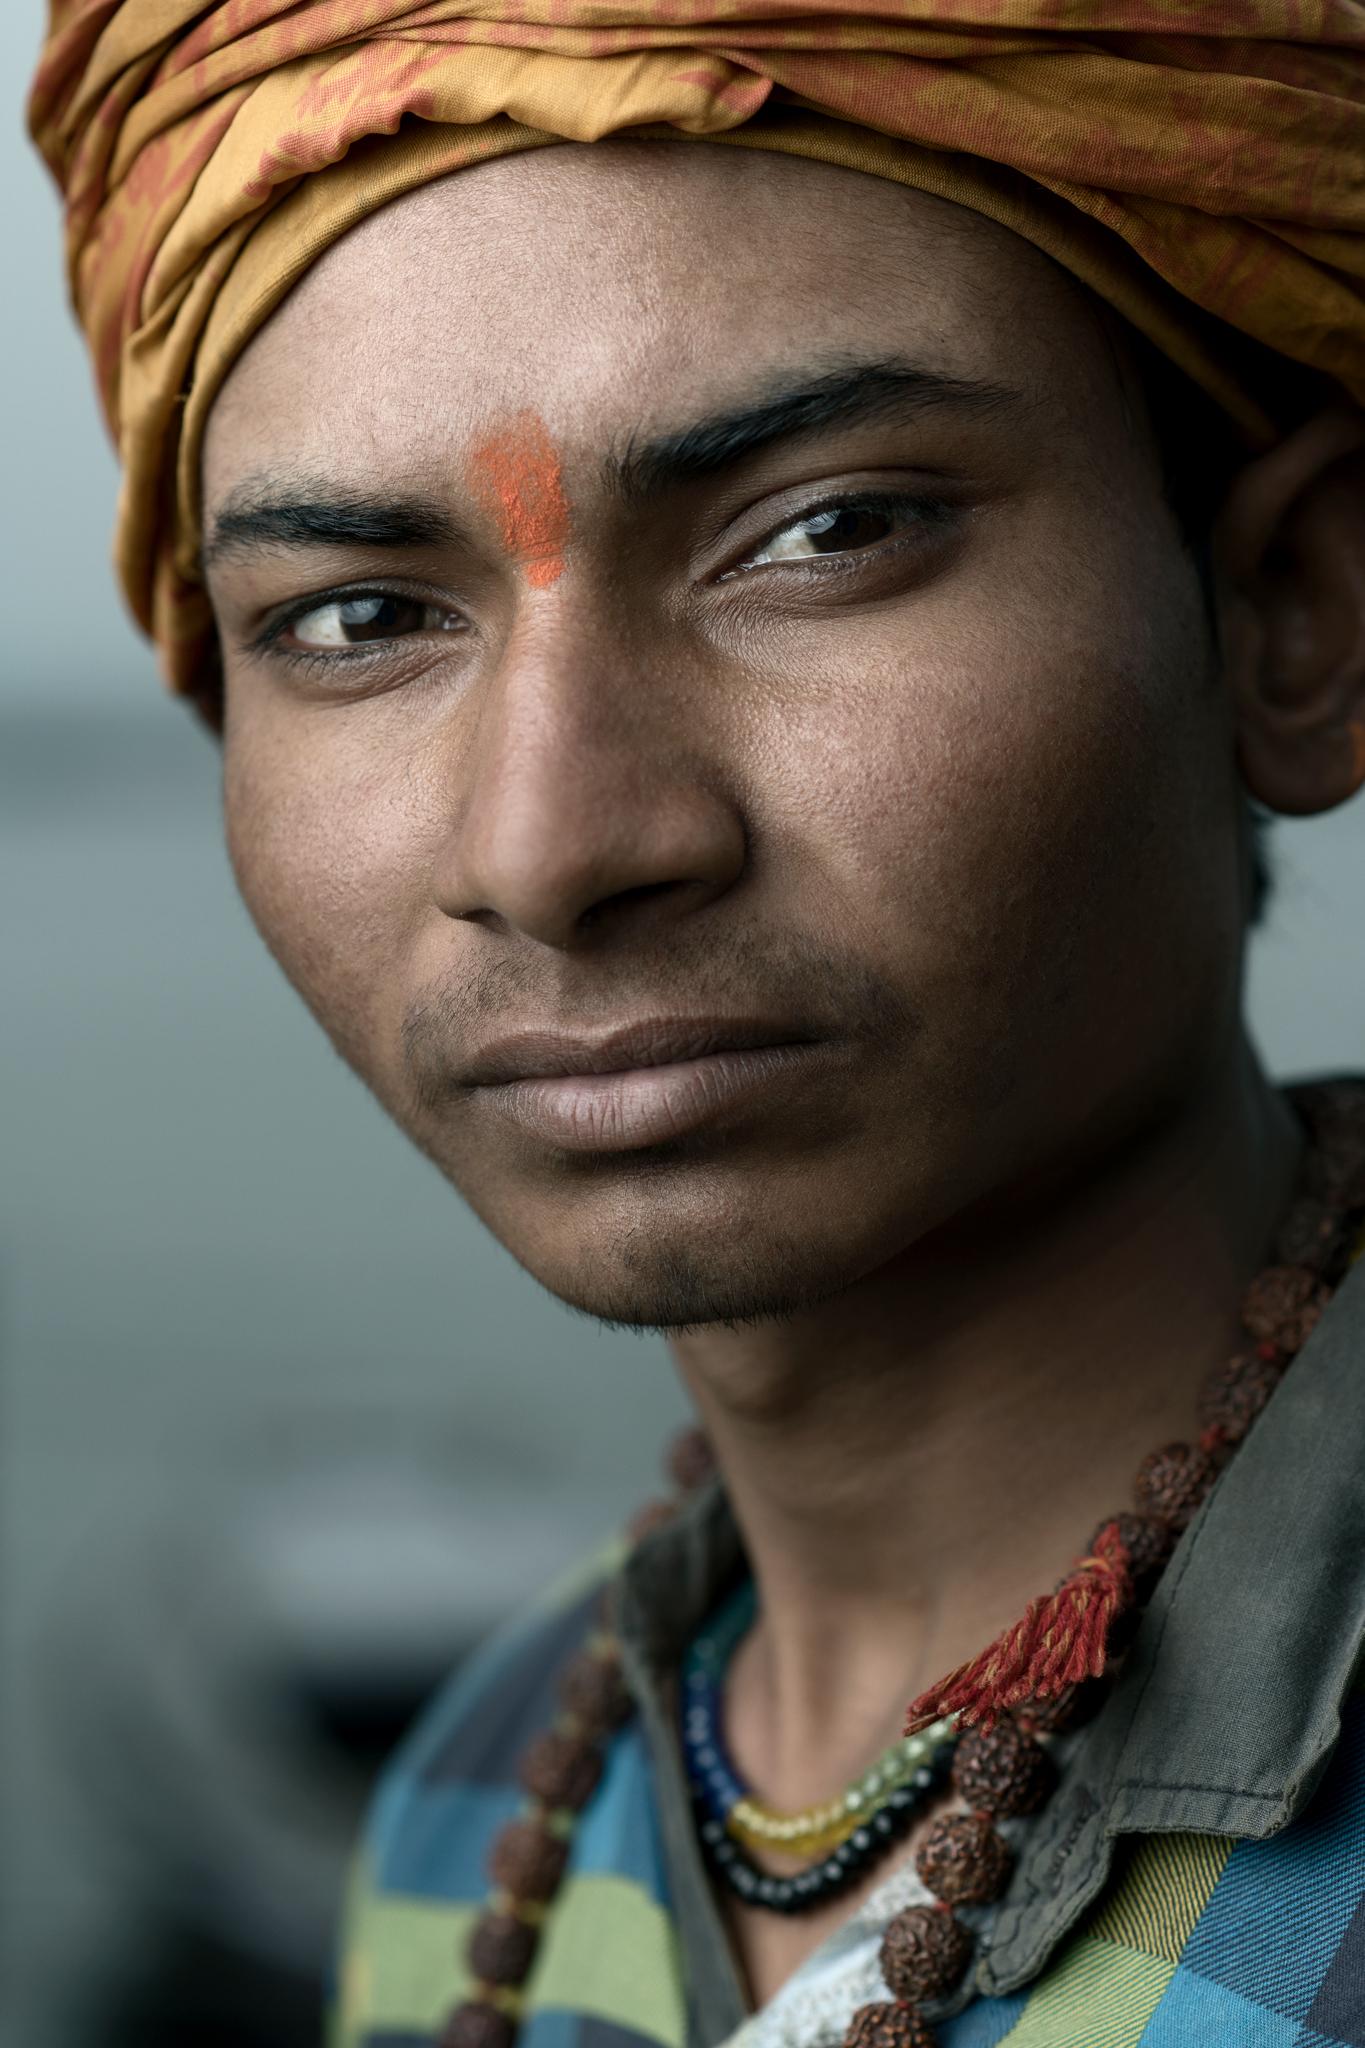 Varanasi_portrait_travel_photography_Manchester_Adventure_Photographer_Jan_Bella11.jpg